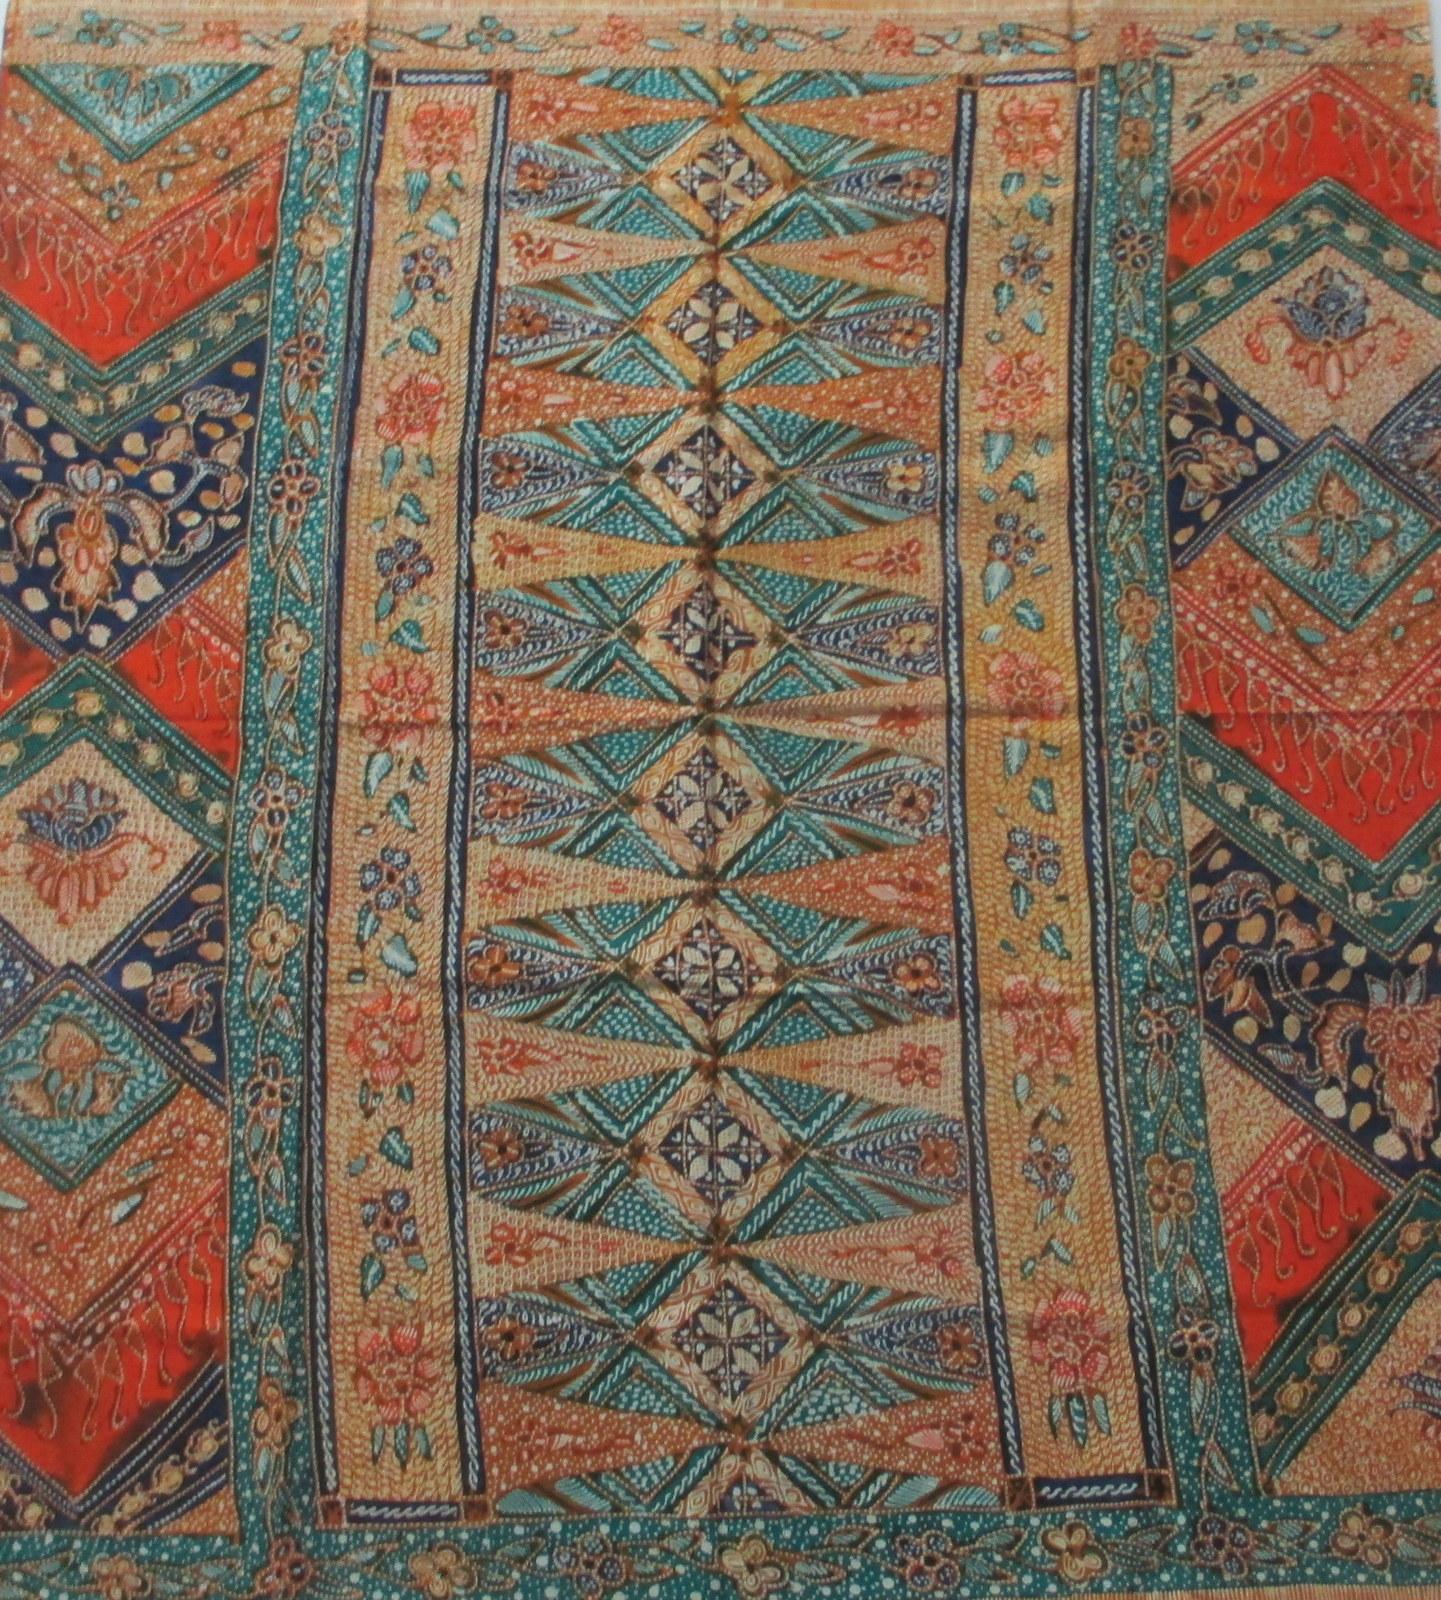 Jual Batik Tulis Pekalongan Klasik Wiradesa 16 Good Store Sarung Tokopedia